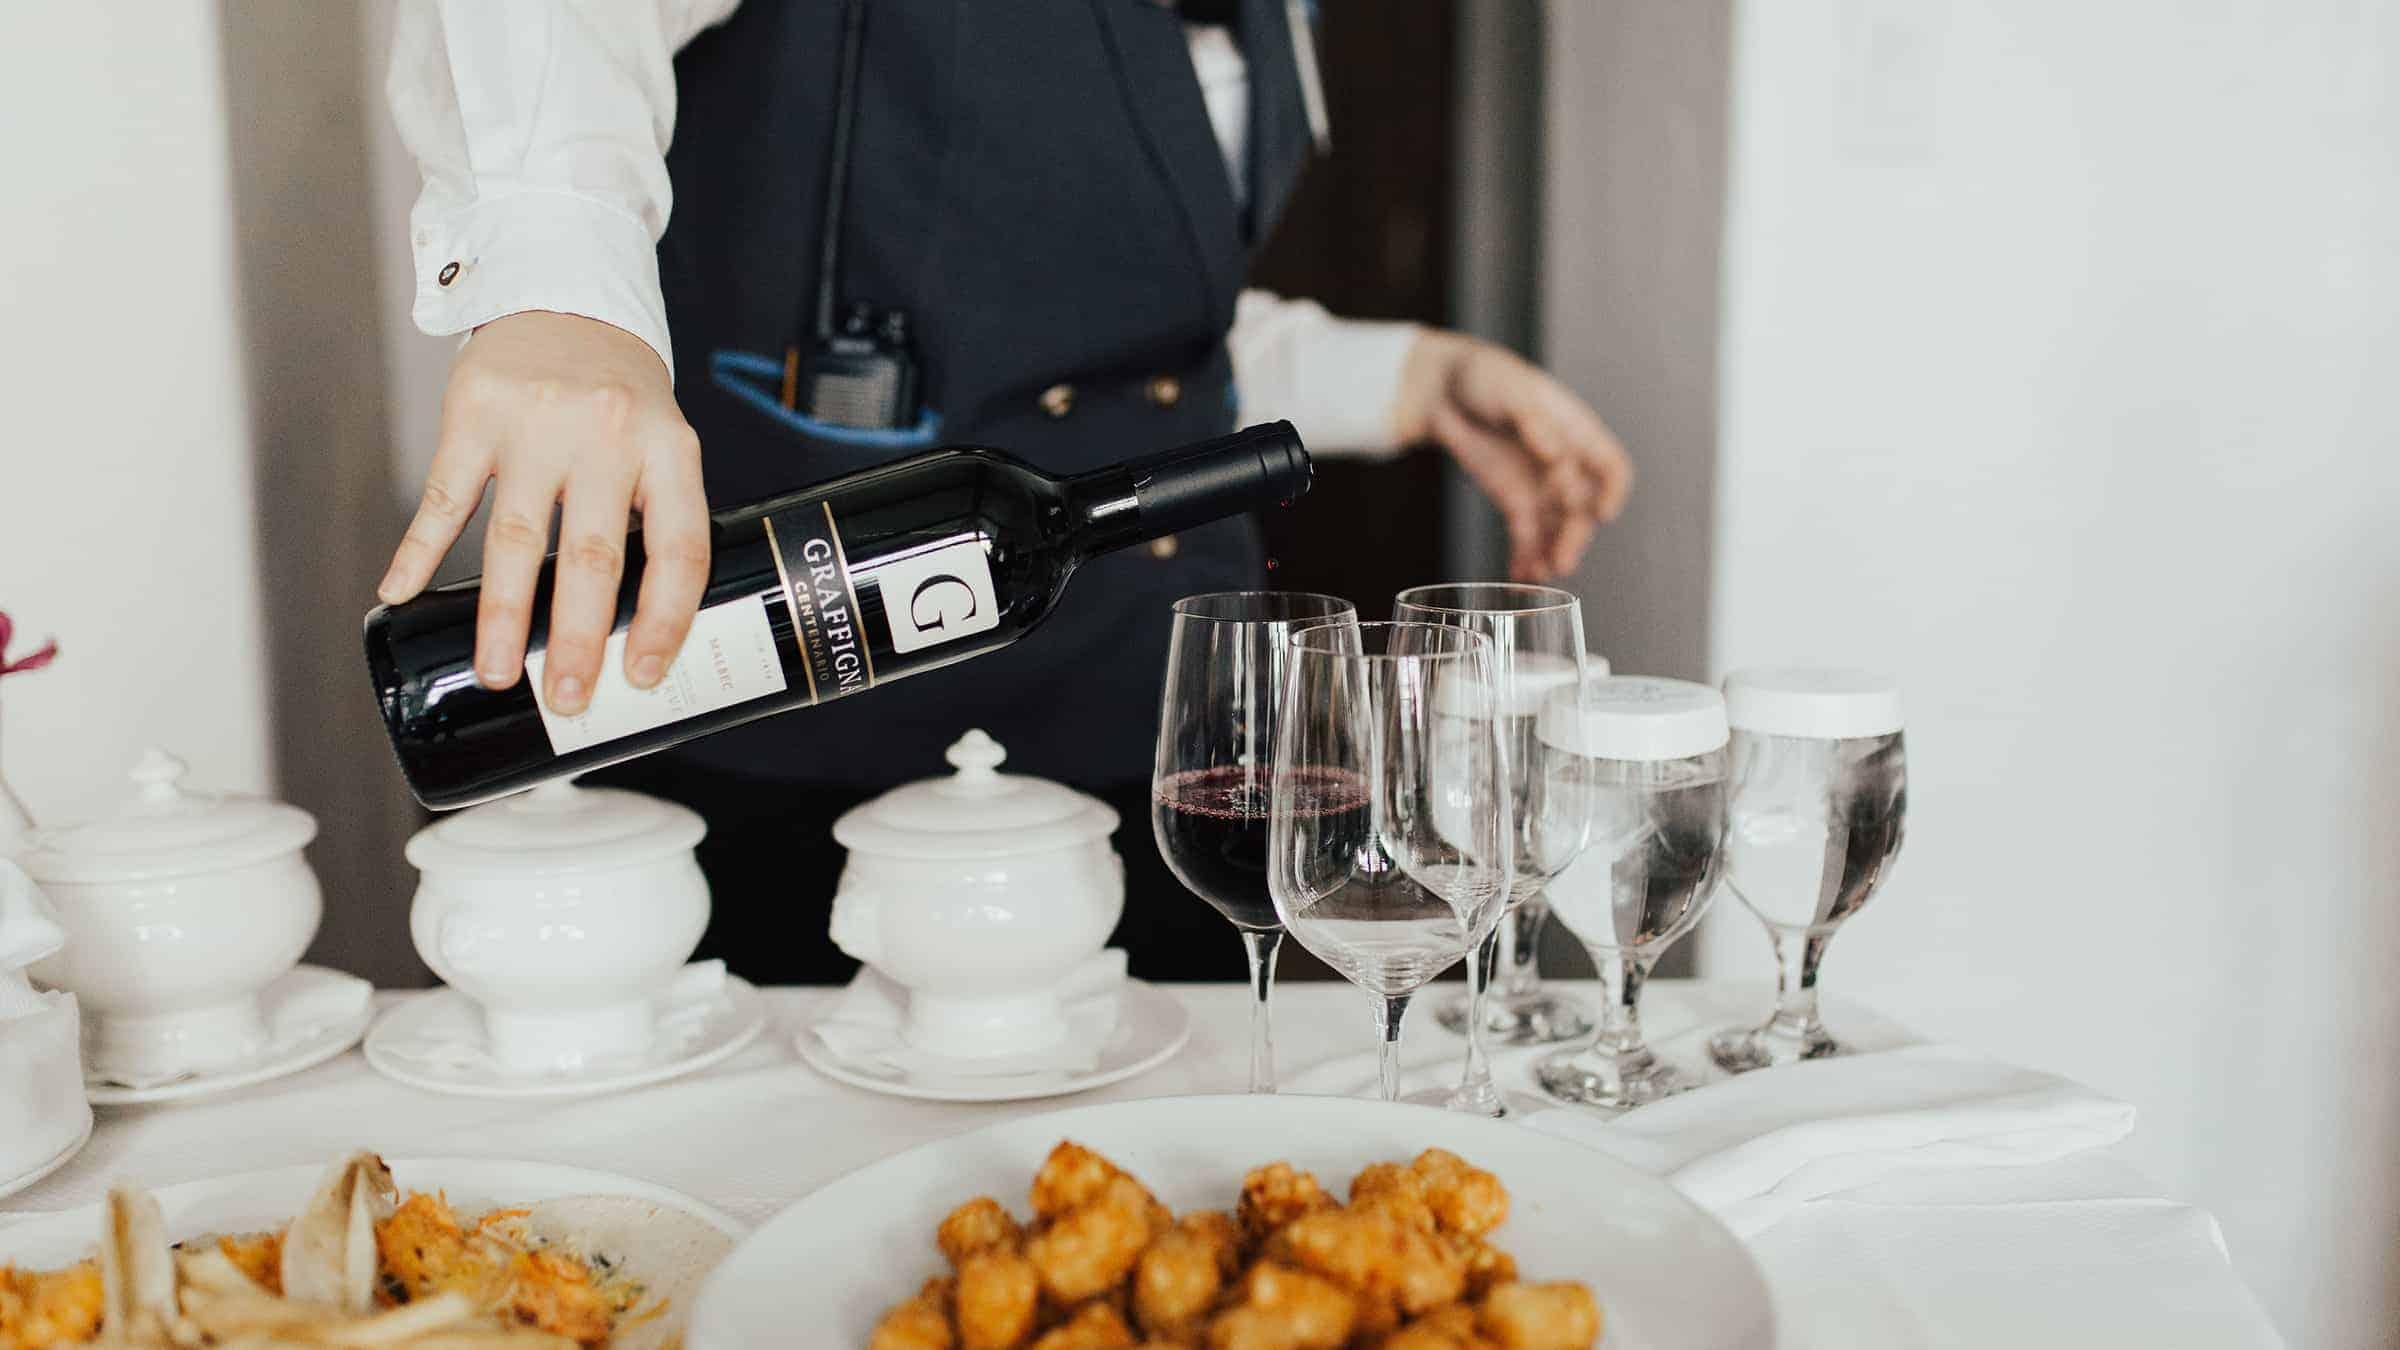 Server pouring wine into glasses